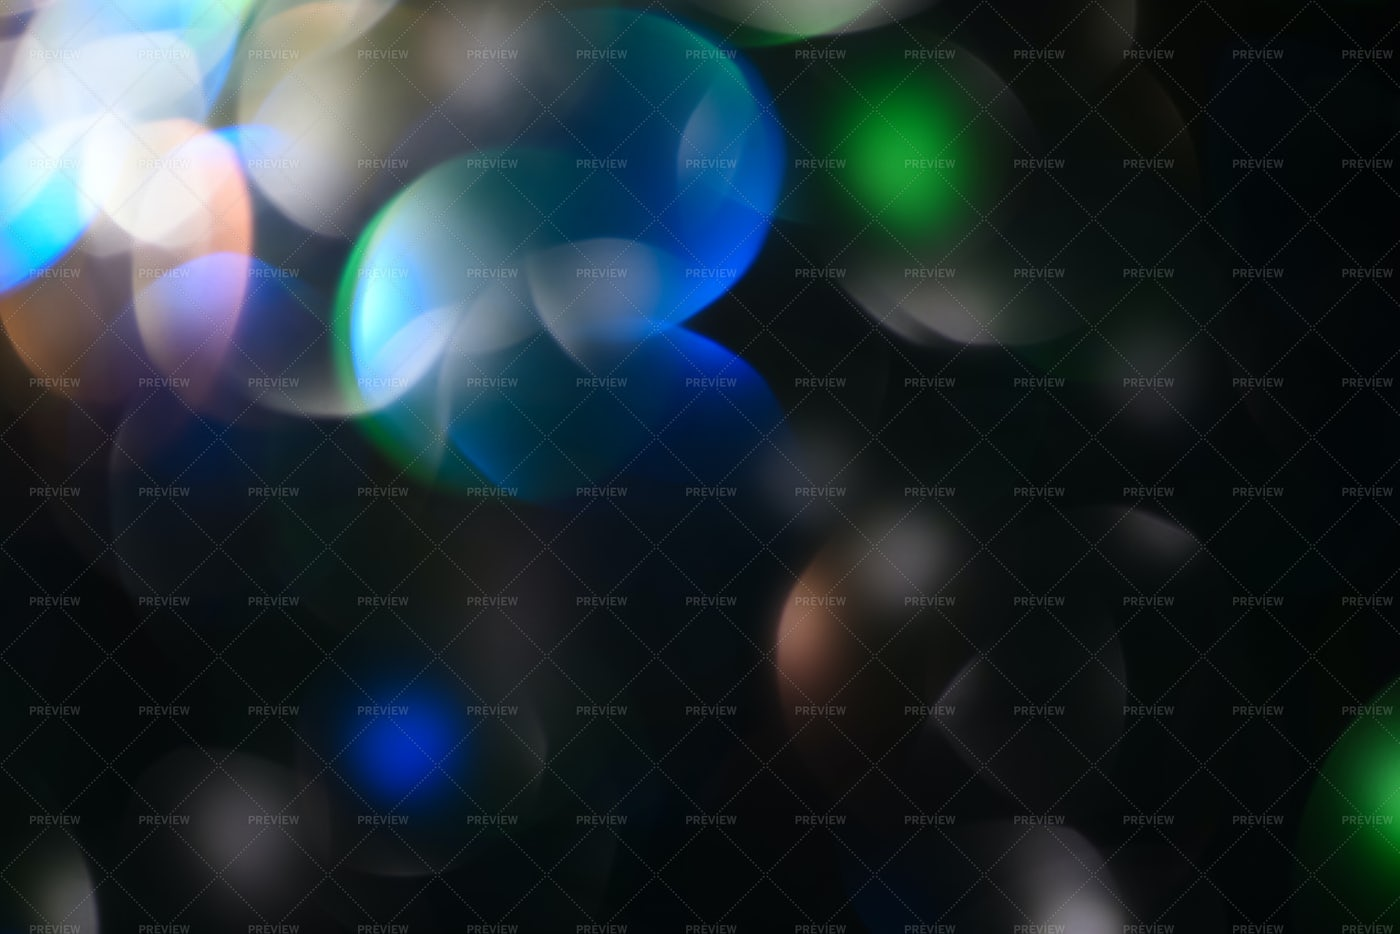 Blue And Green Bokeh Lights: Stock Photos